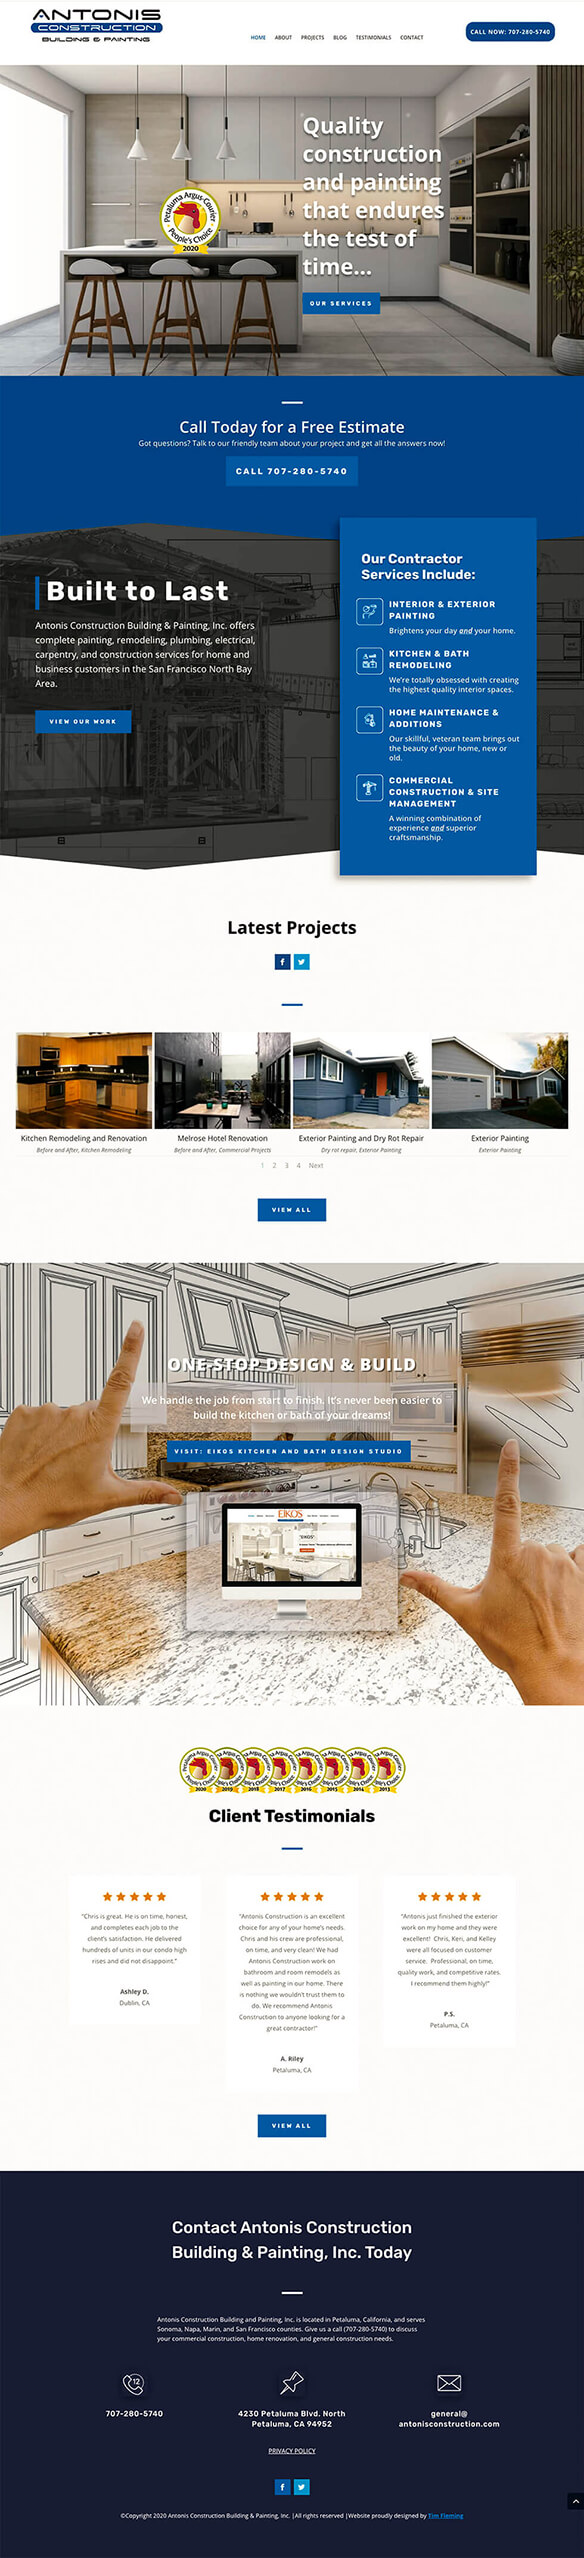 Antonis Construction page mockup